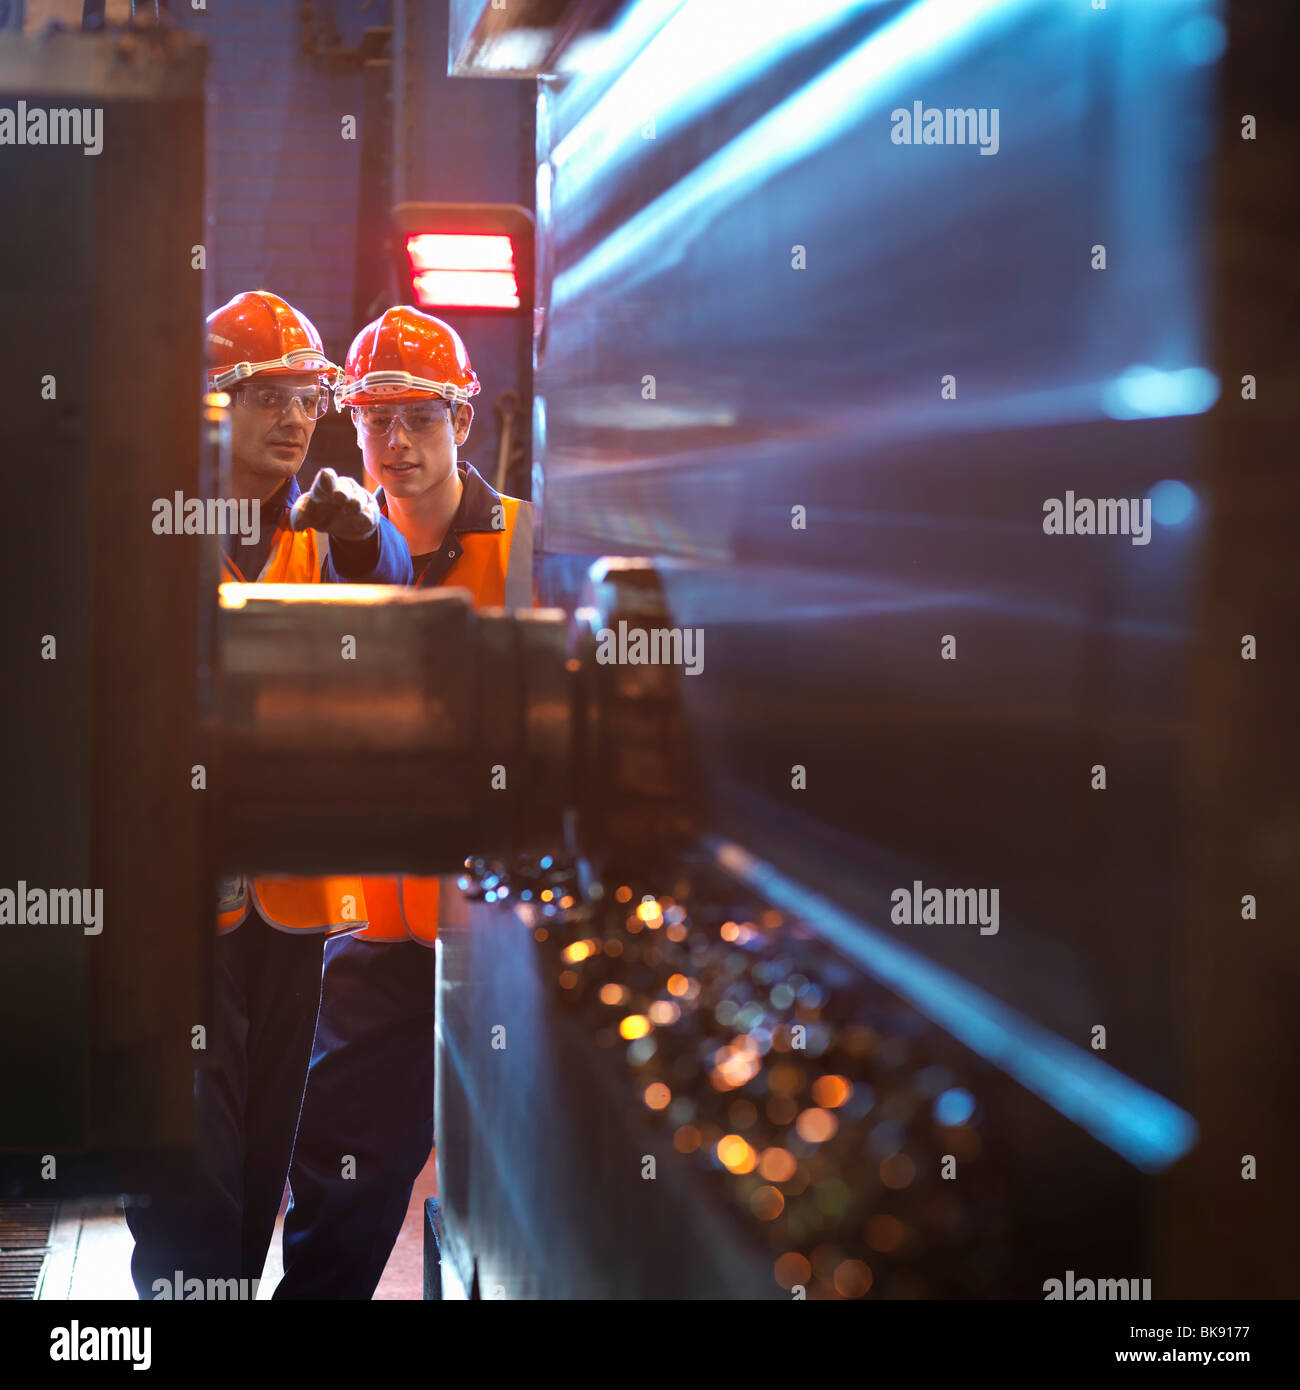 Engineer & Apprentice Using Cutting Tool - Stock Image